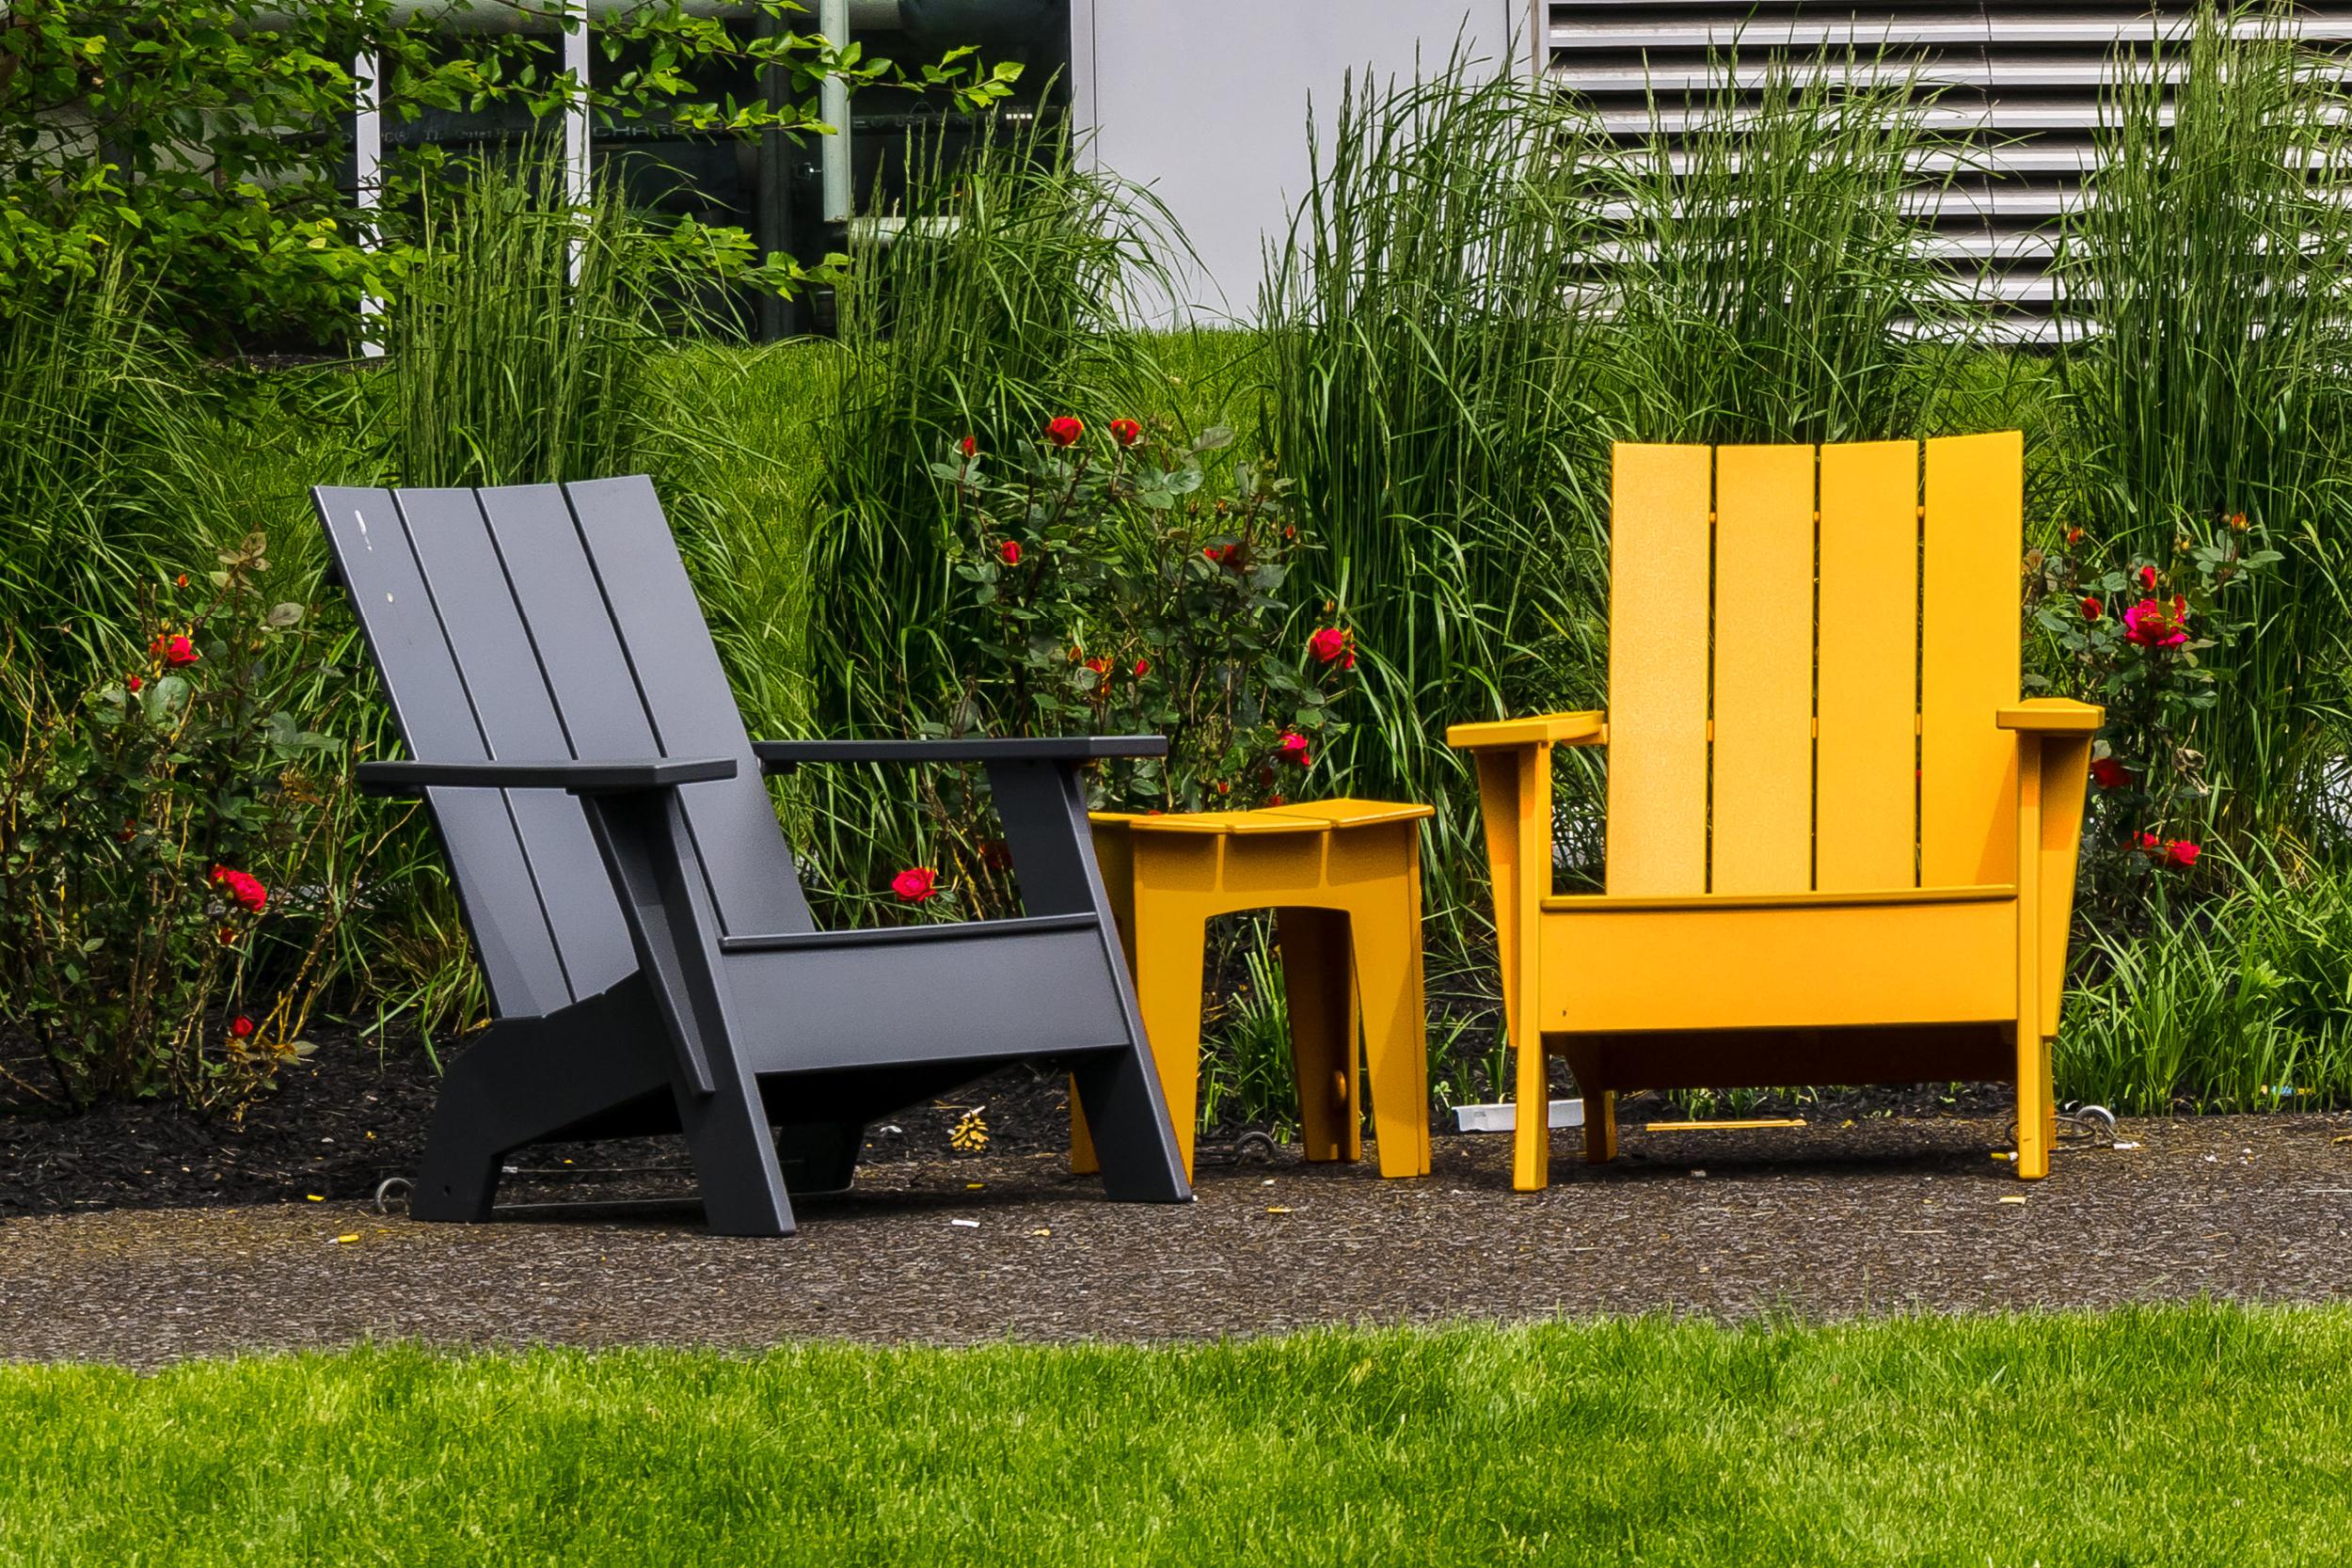 designboard uv outdoor uv resistant material